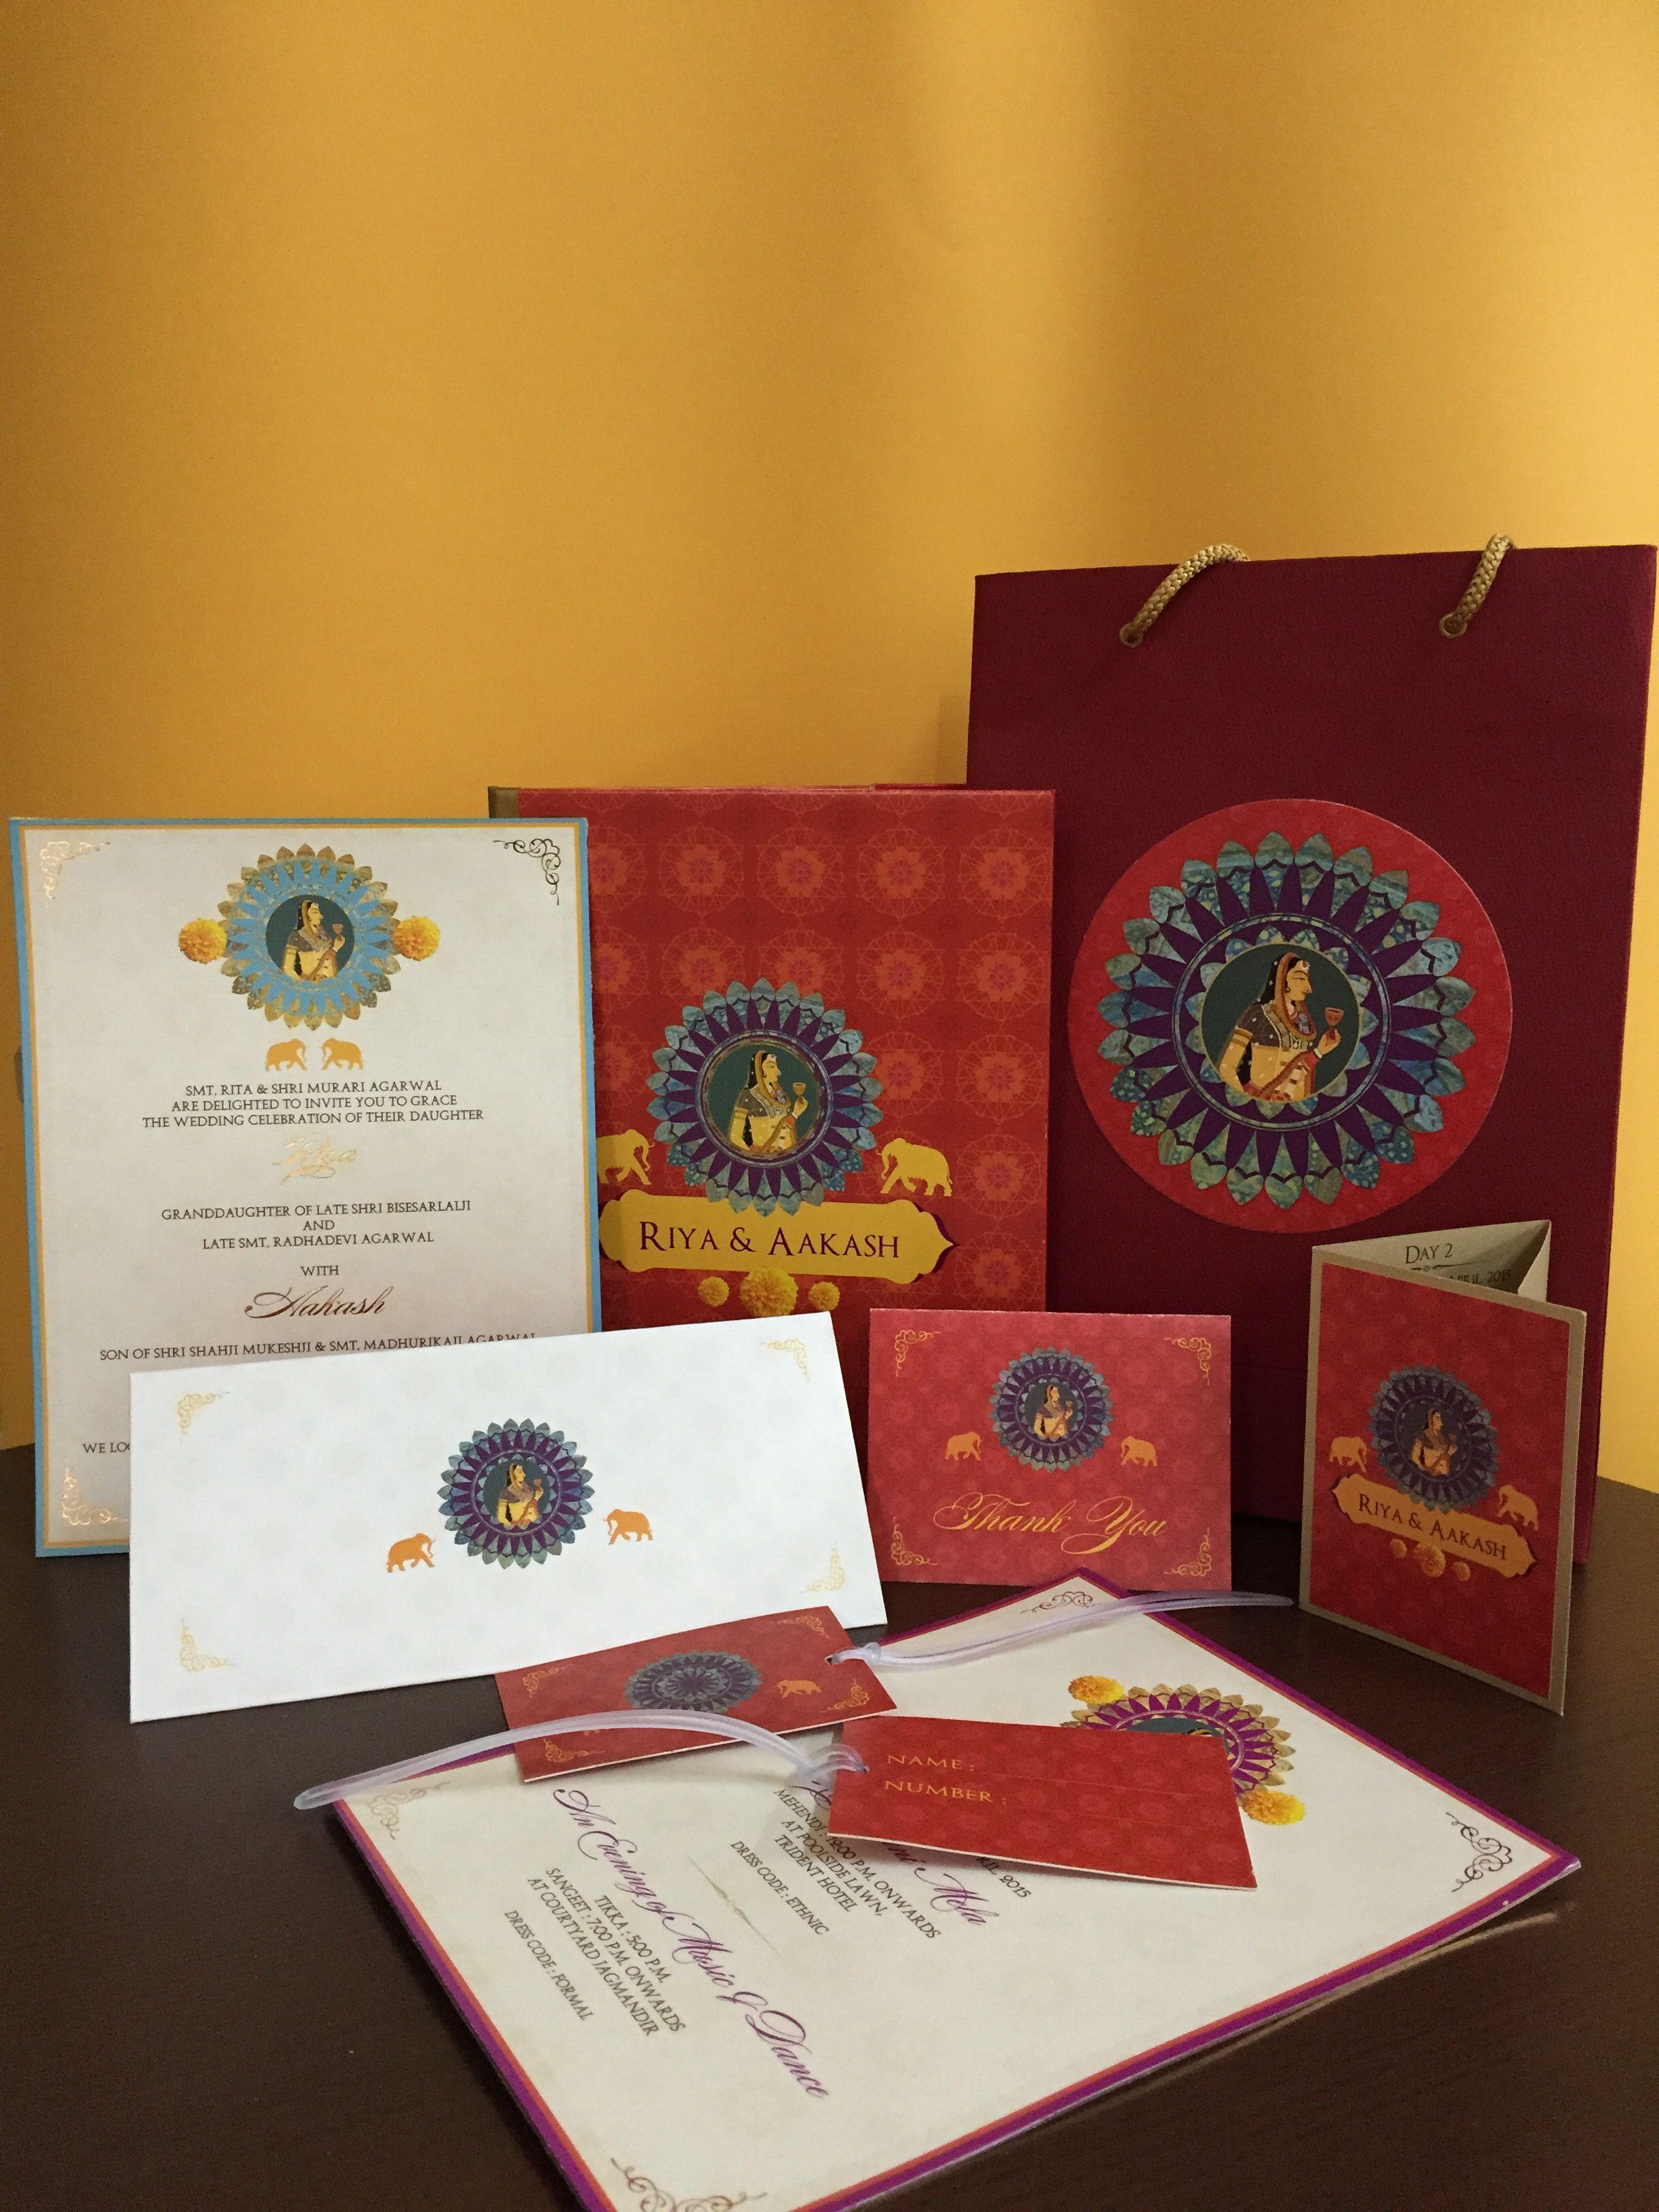 indian wedding invitation mumbai%0A A souveriner holder inside the invite by KRIMSON   Wedding Invitation Ideas    Pinterest